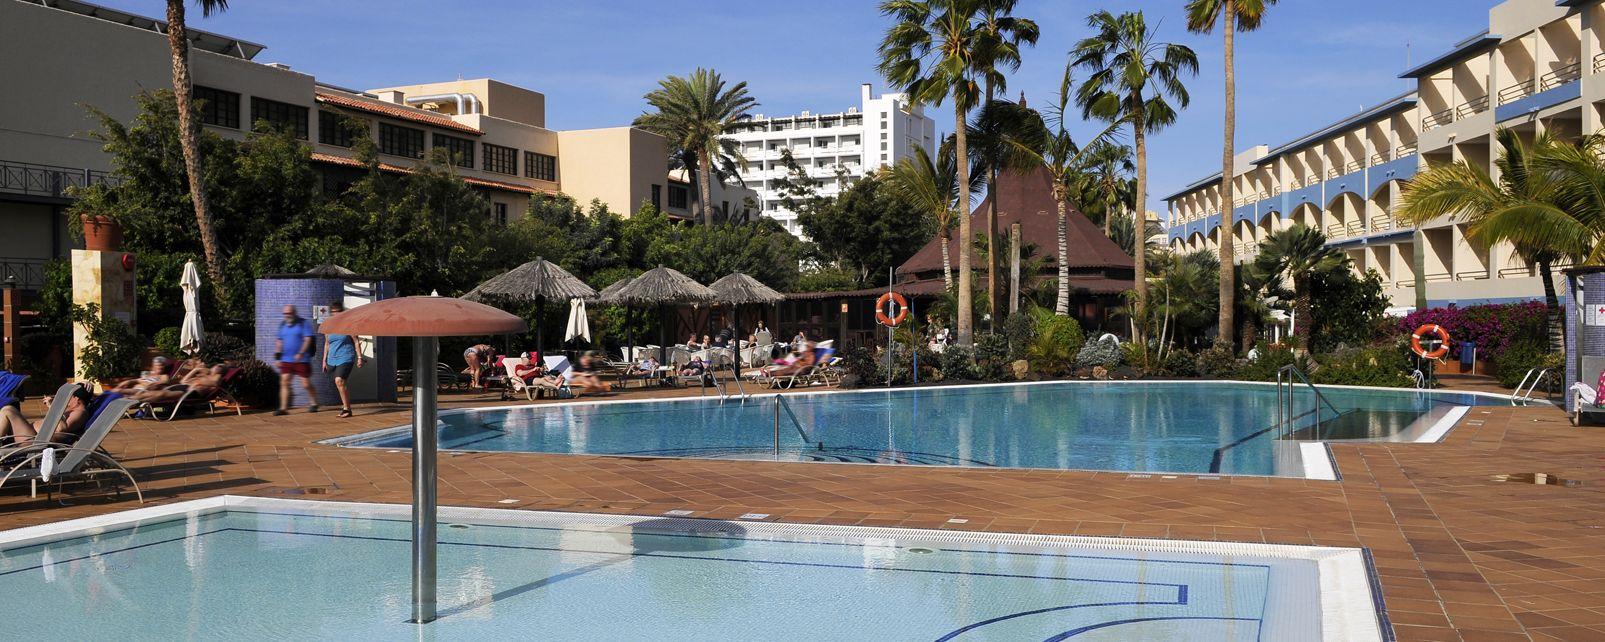 Hotel Club Jumbo Ifa Altamarena